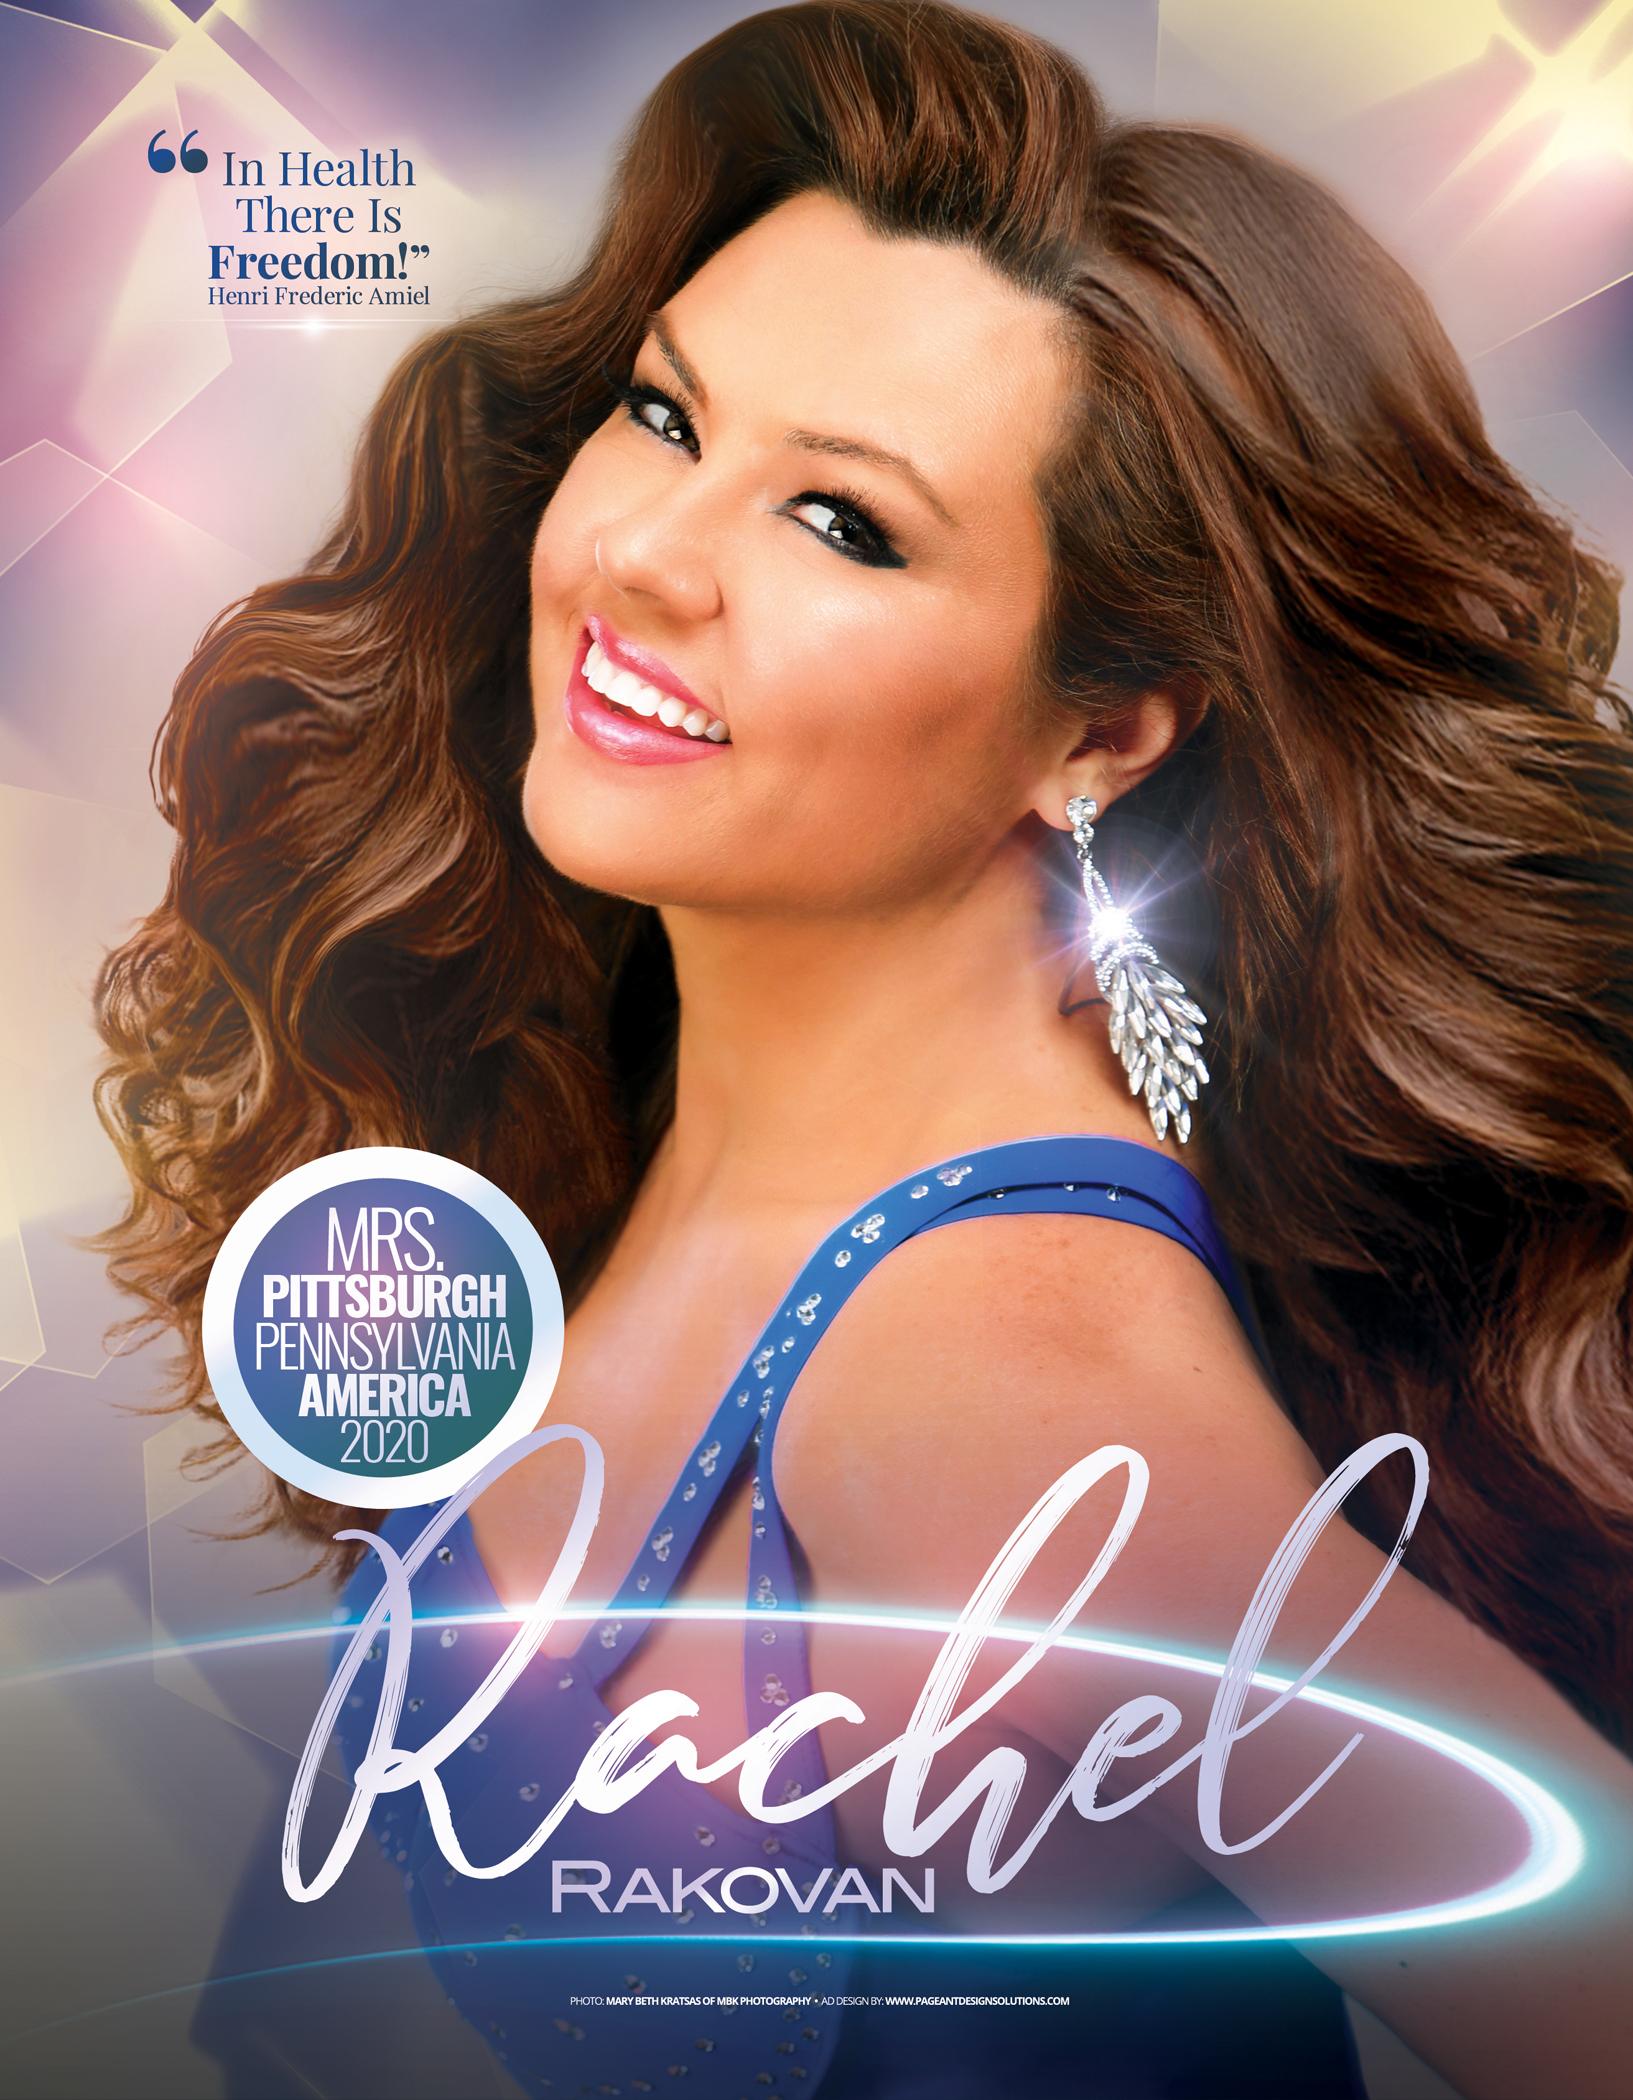 Rakovan, Rachel AD 1